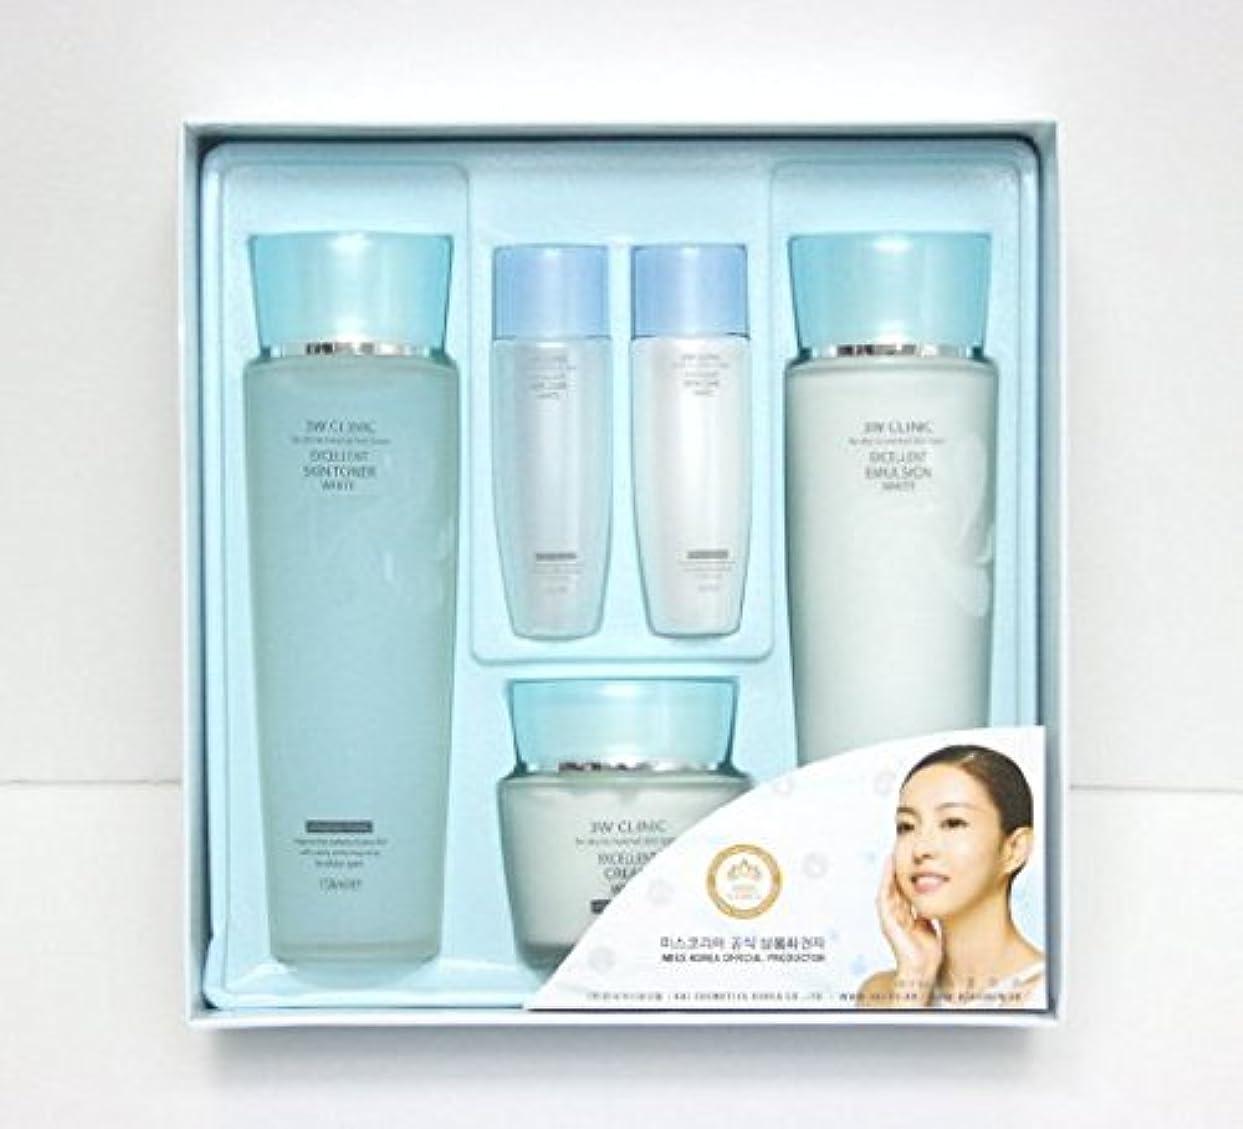 3Wクリニック[韓国コスメ3w Clinic]Excellent White Skin Care set エクセレントホワイトスキンケア3セット,樹液,乳液,クリーム [並行輸入品]